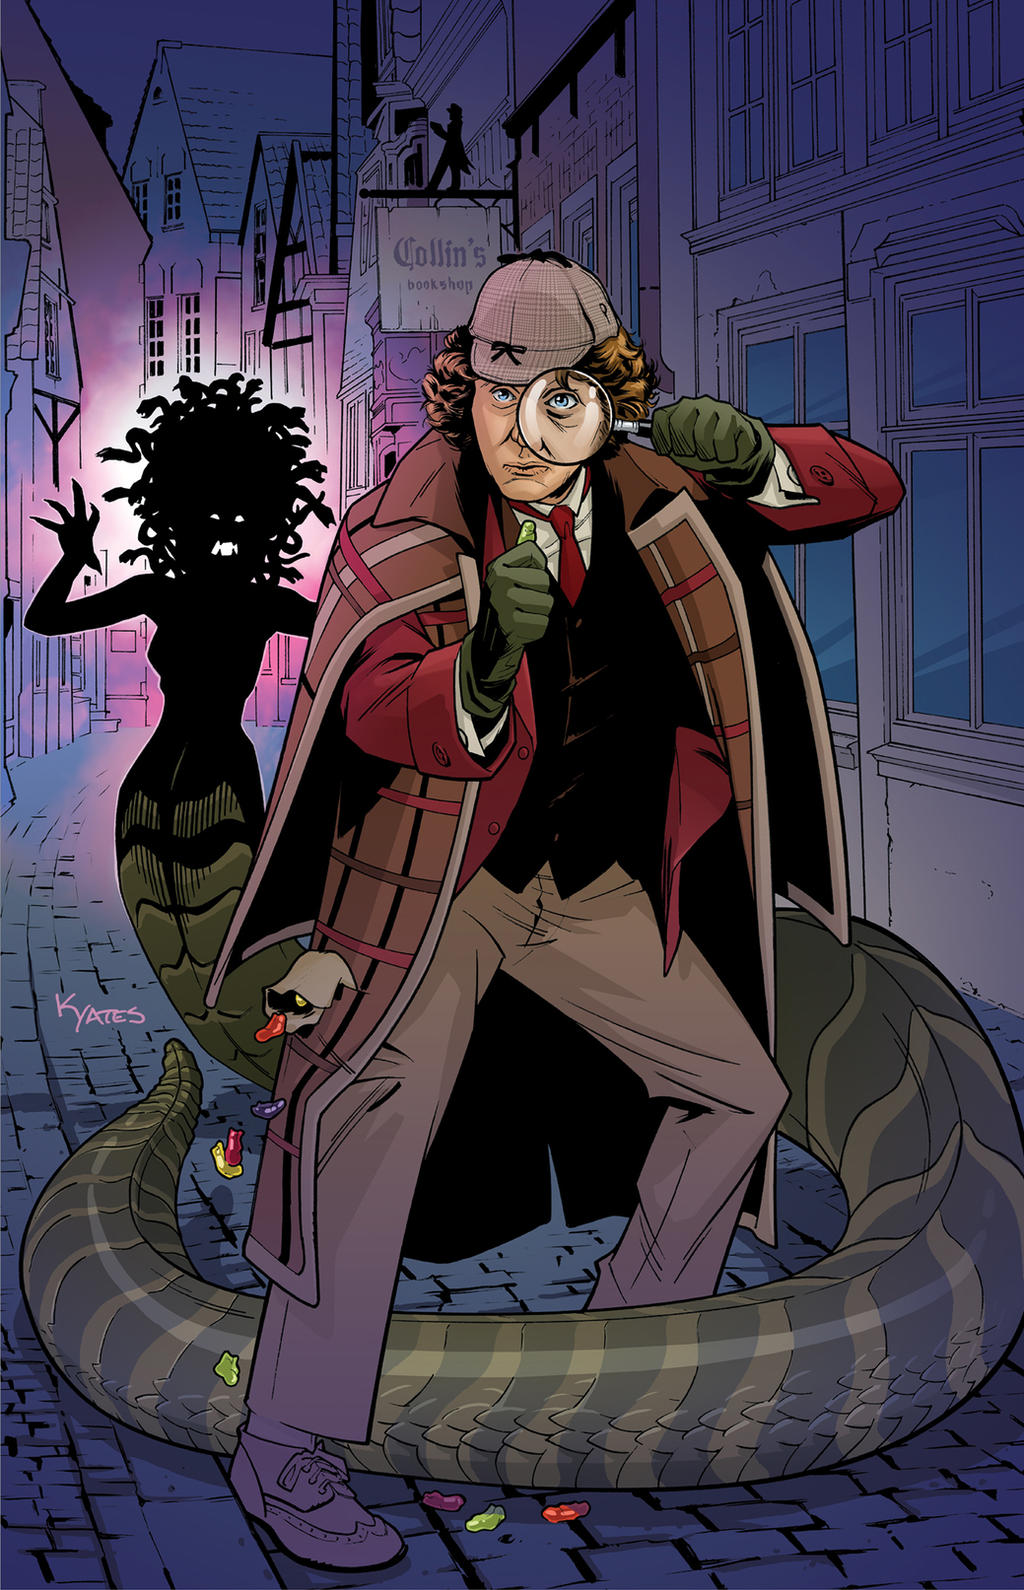 4th Doctor Titan Comics by KellyYates